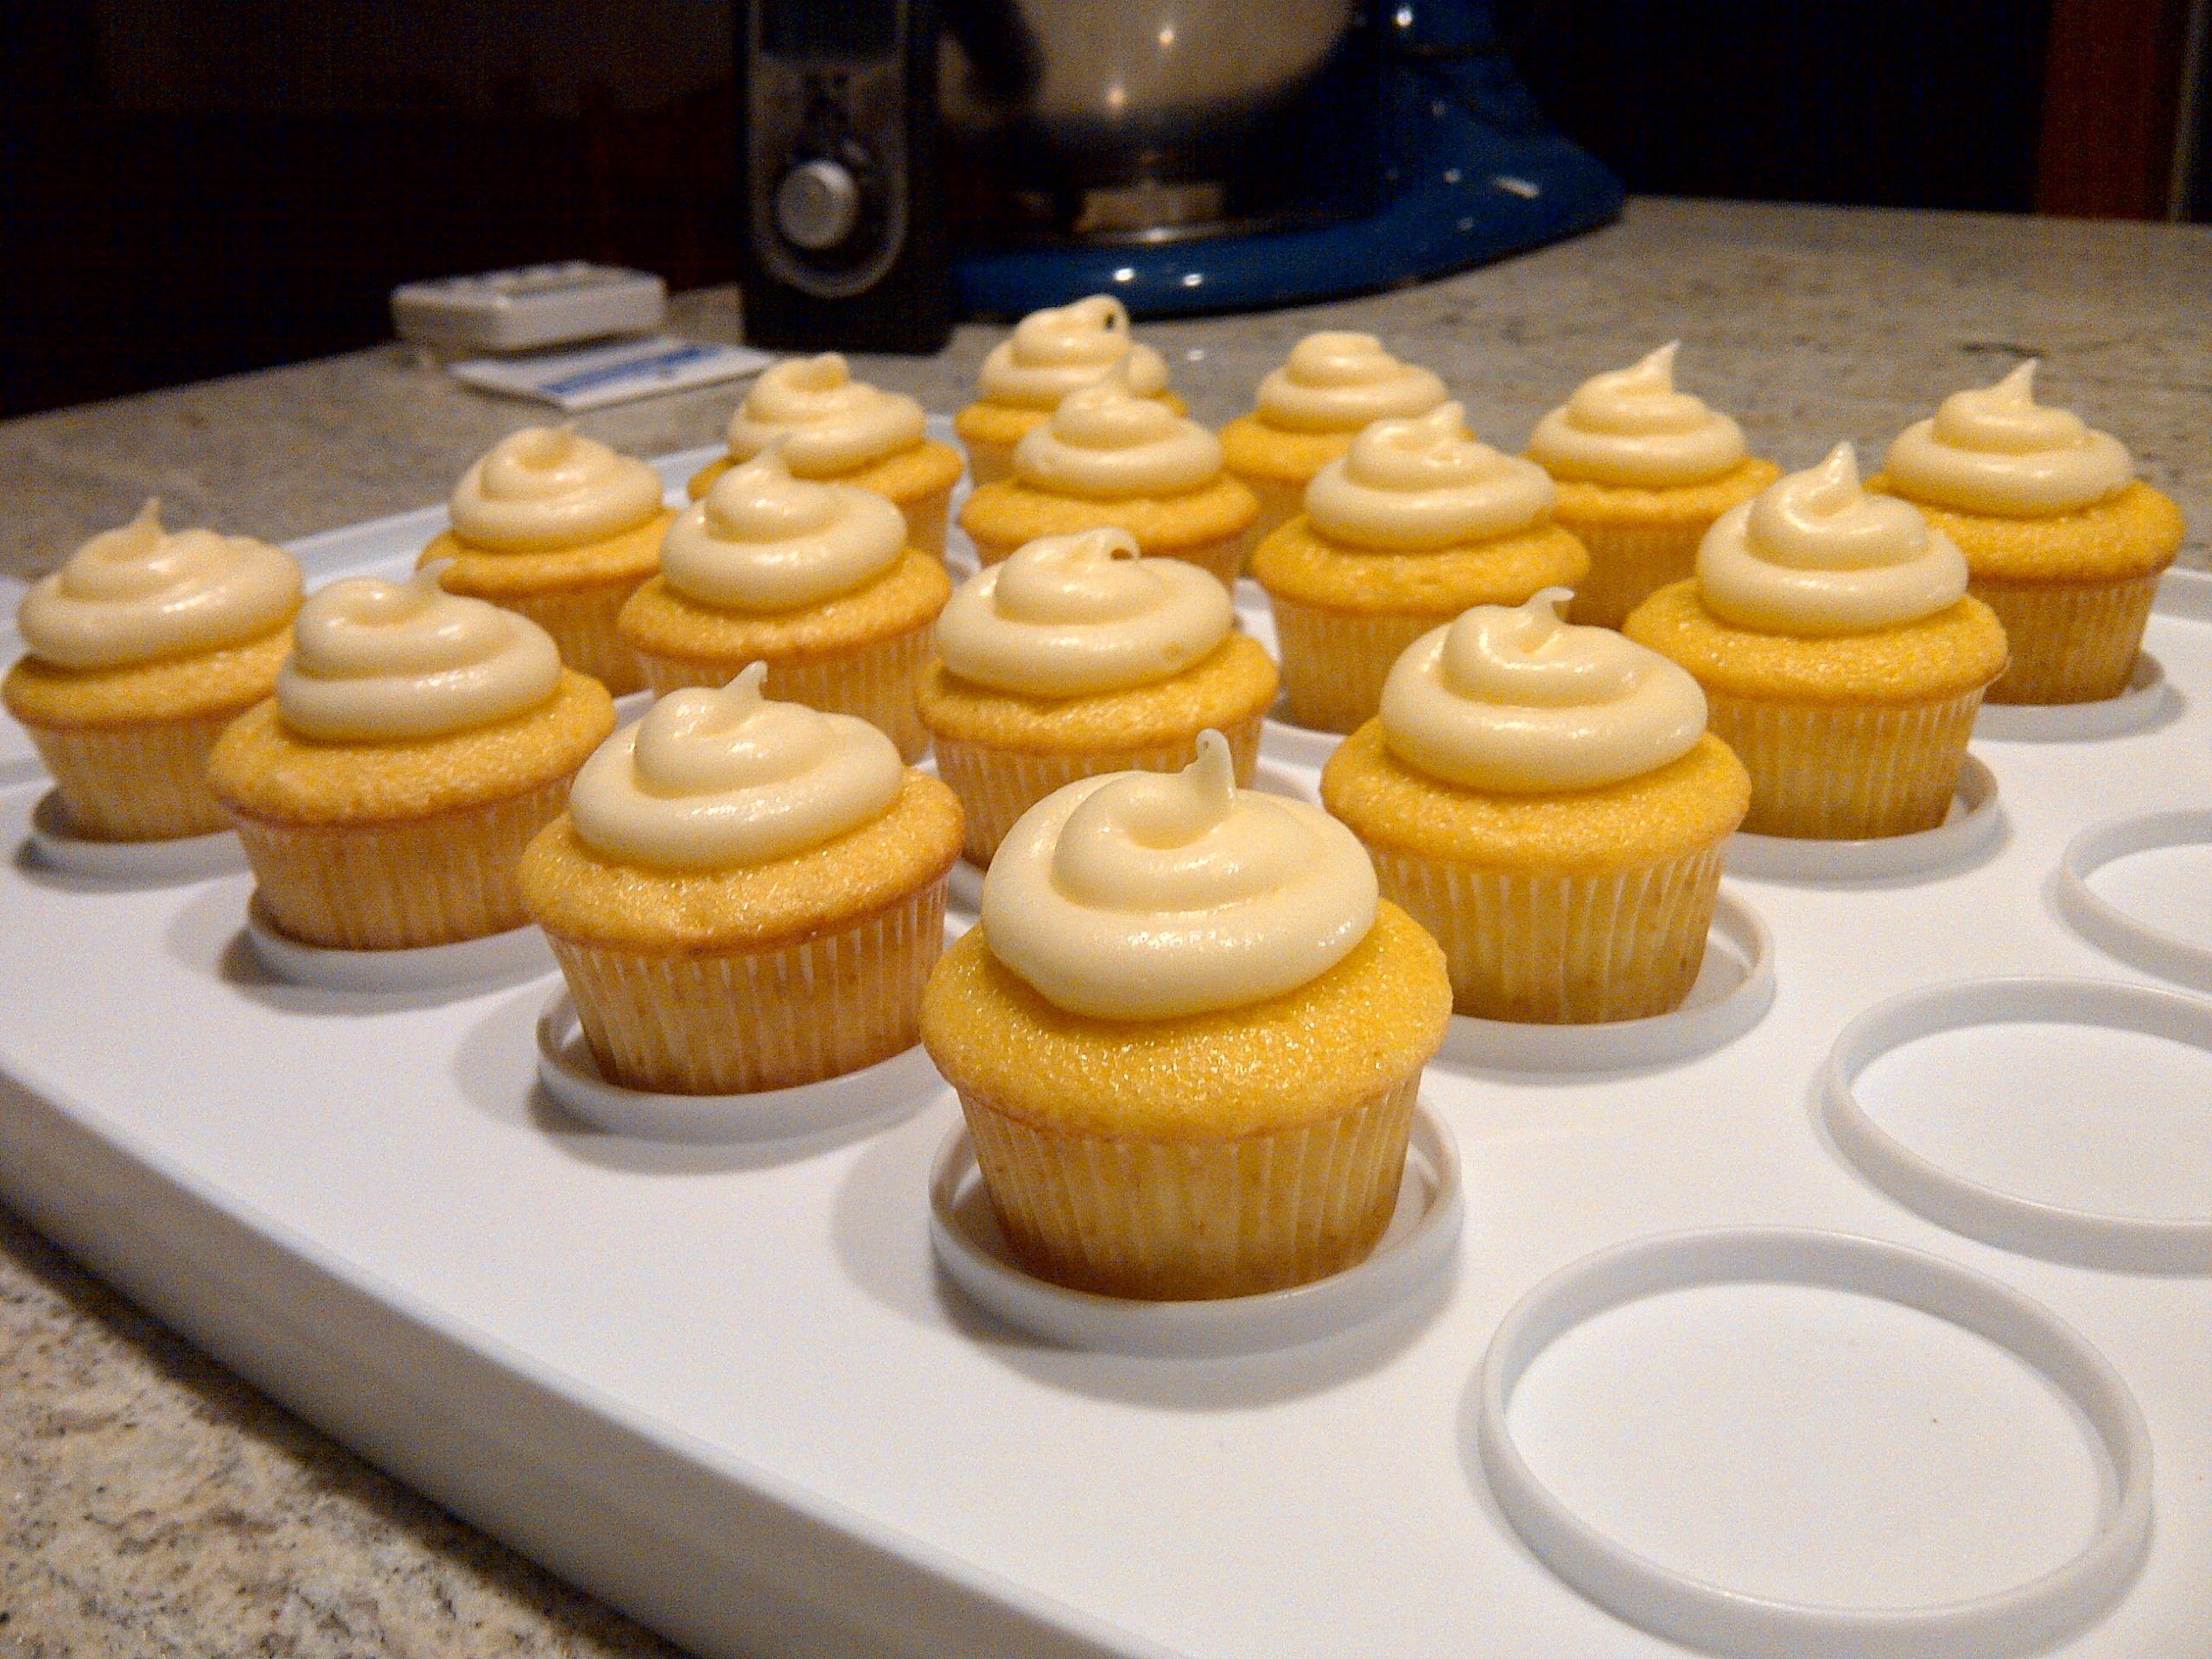 Lemon Cupcakes w/ Lemon-infused Cream Cheese Frosting